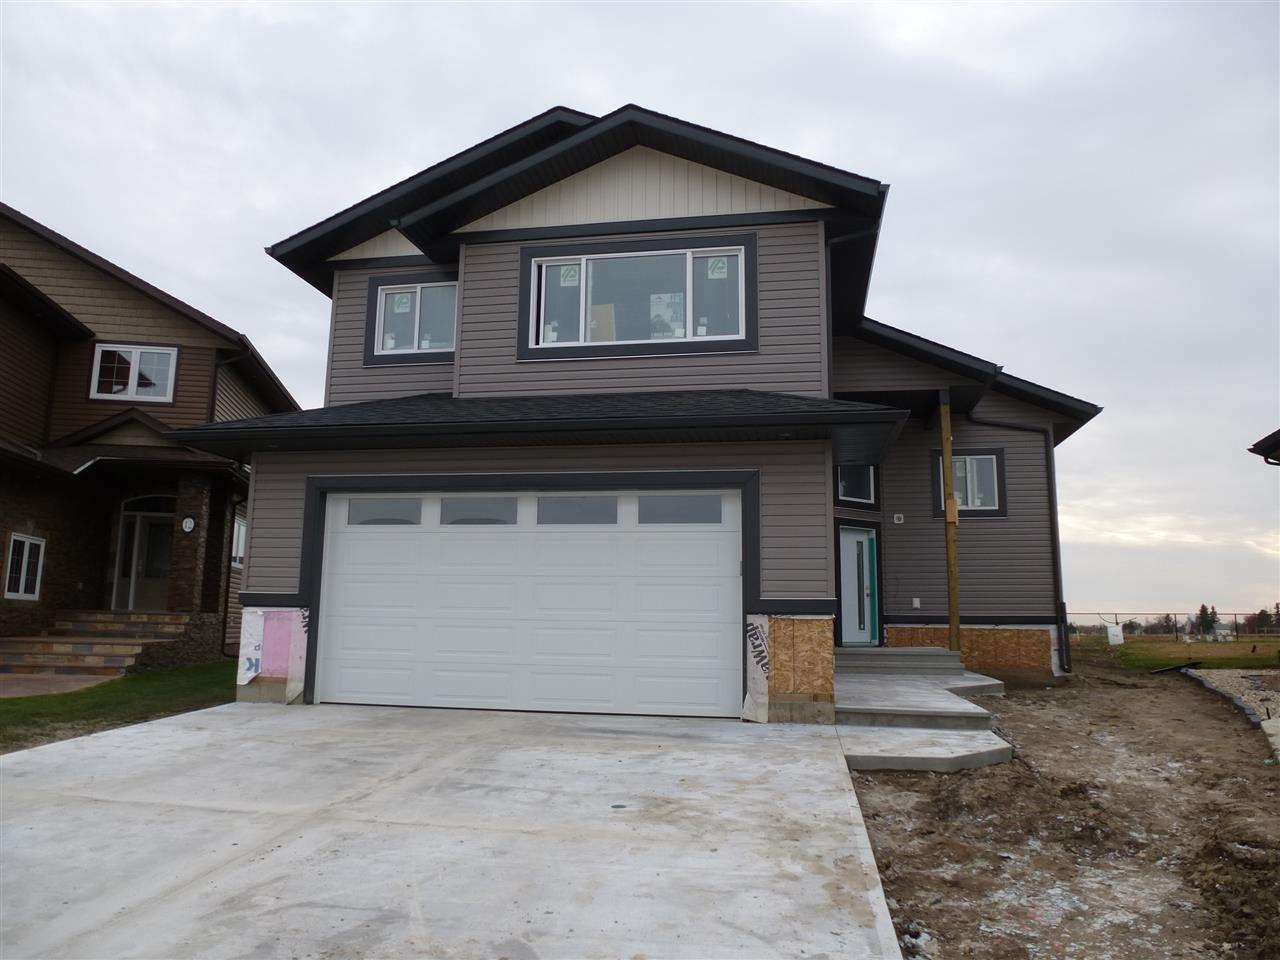 Main Photo: 13 Norwood Close: Wetaskiwin House for sale : MLS®# E4120705